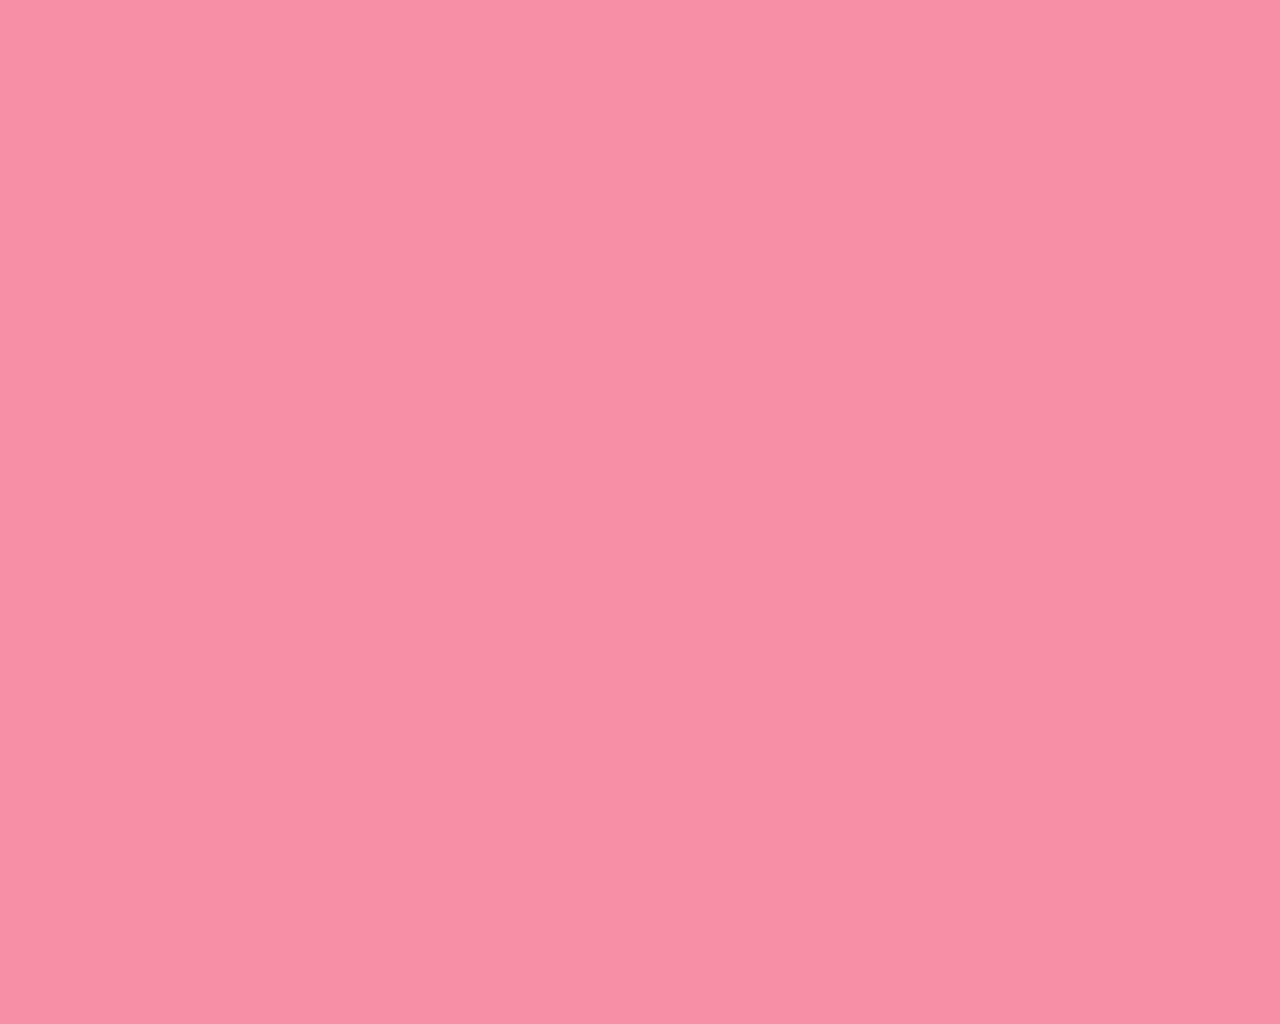 1280x1024 Pink Sherbet Solid Color Background